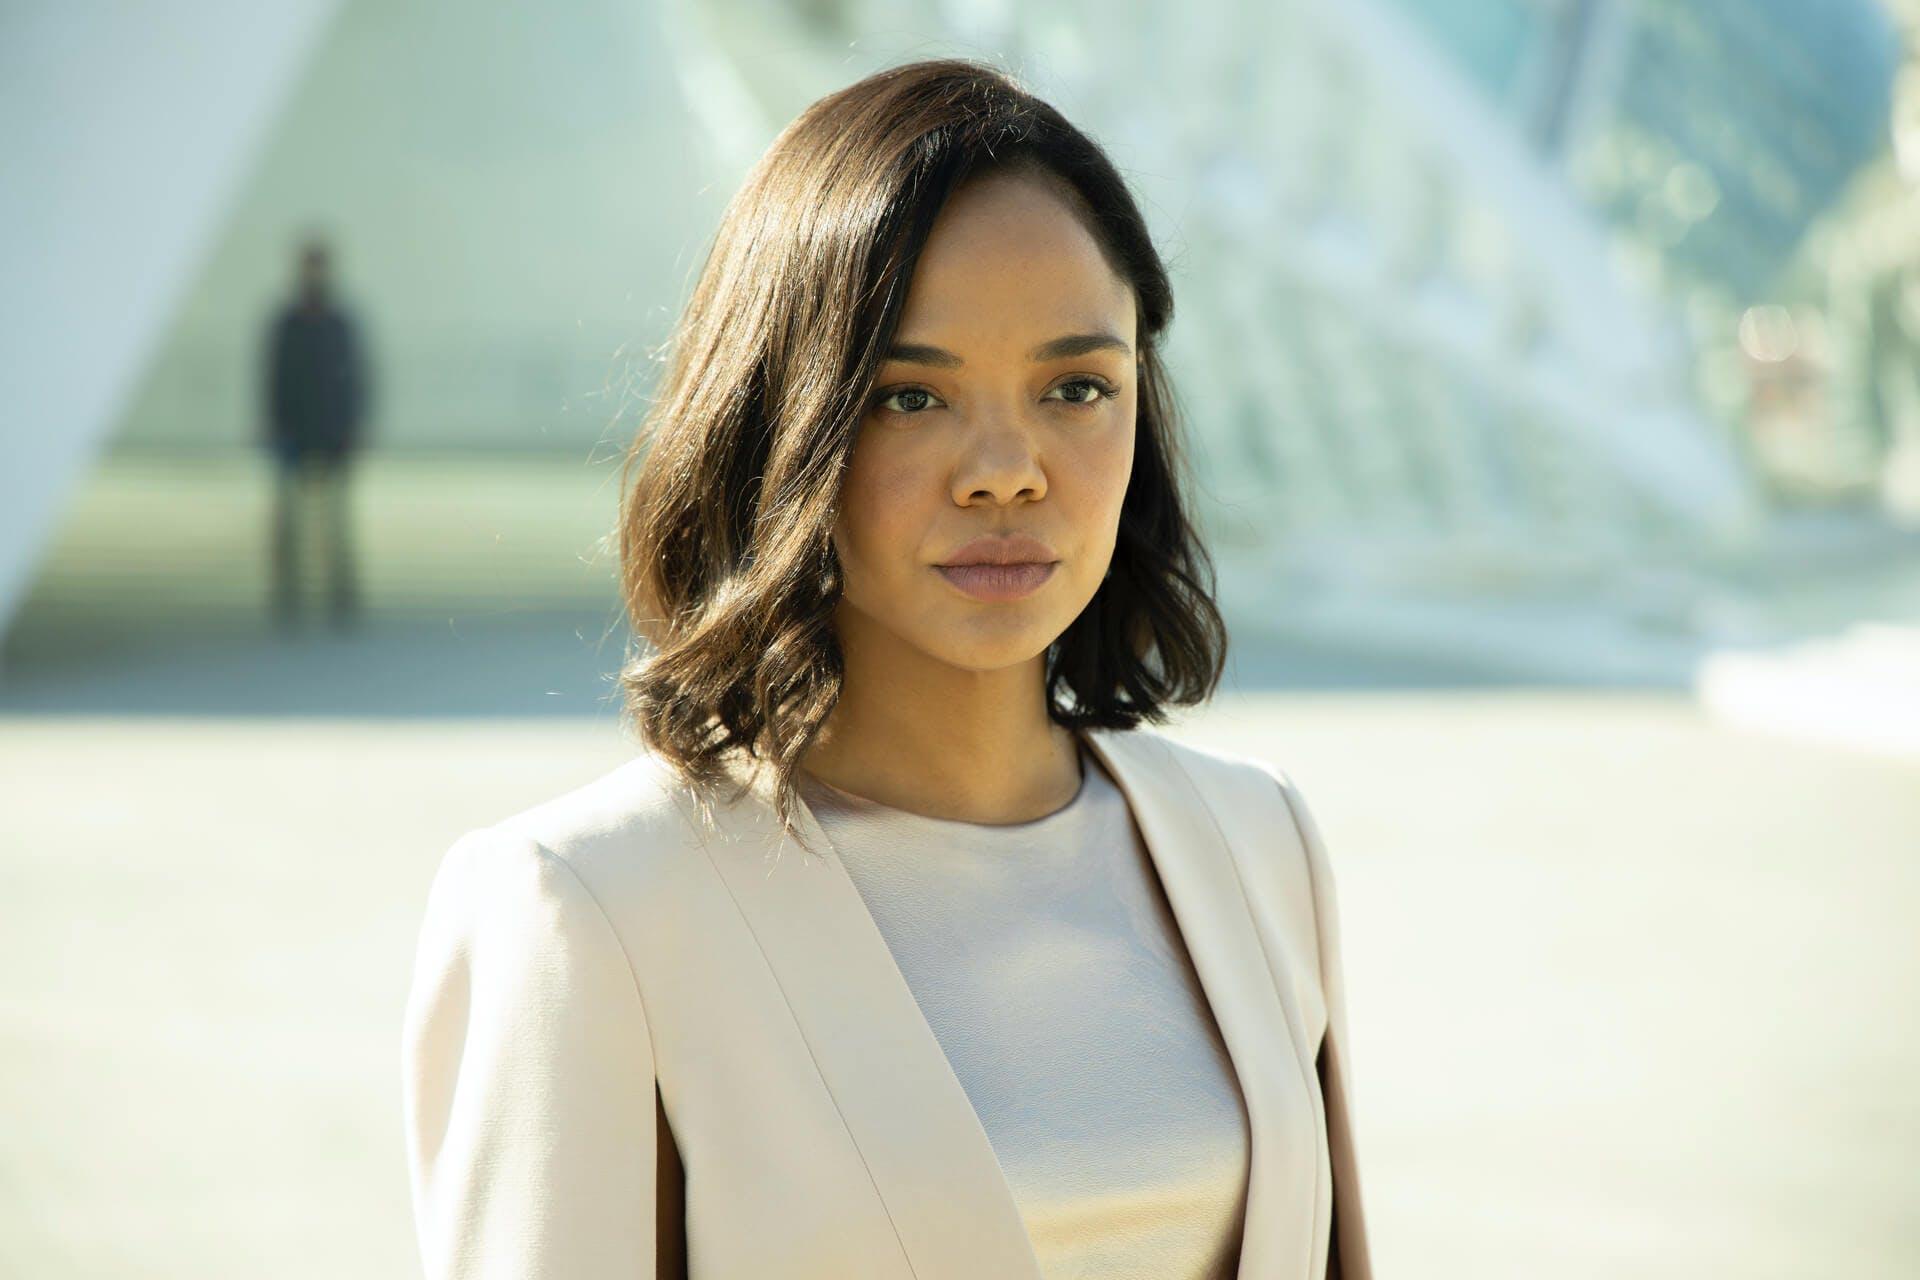 hbo westworld season 3 episode 1 recap